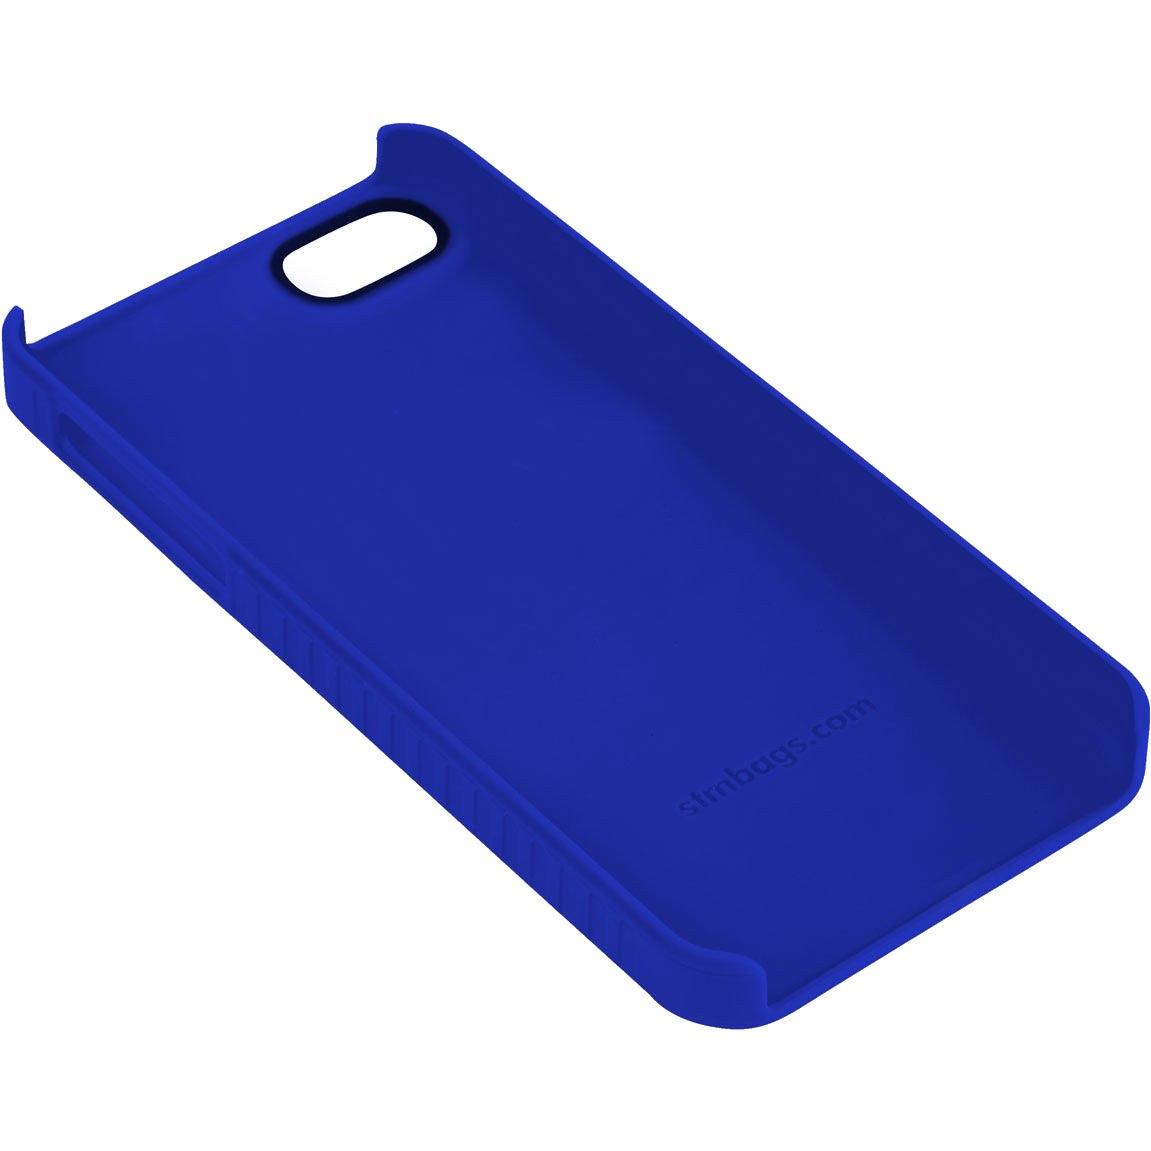 STM Goods grip Case for iPhone - Blue